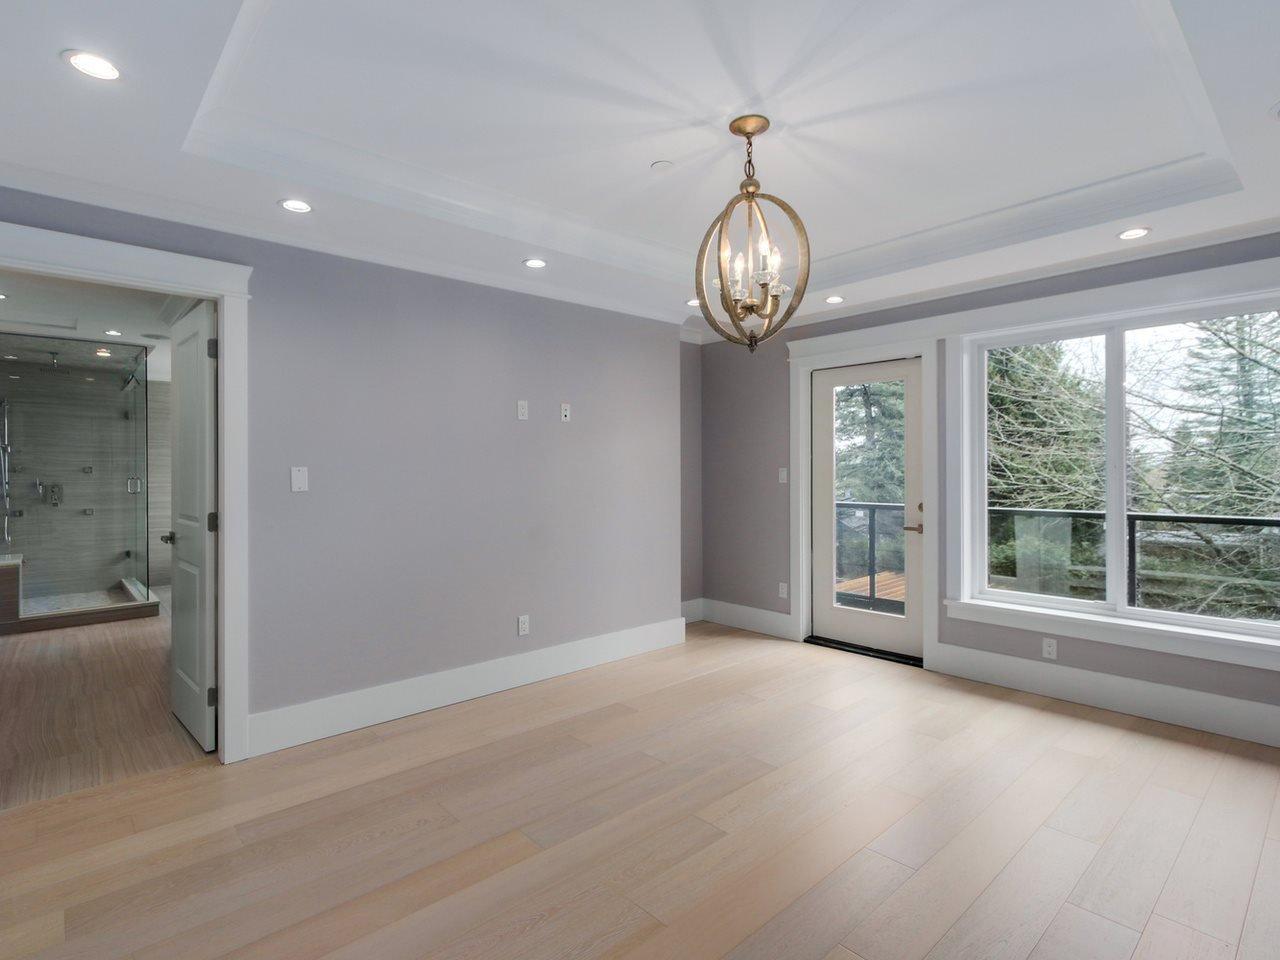 Photo 13: Photos: 1560 MAPLE Street: White Rock House for sale (South Surrey White Rock)  : MLS®# R2138926